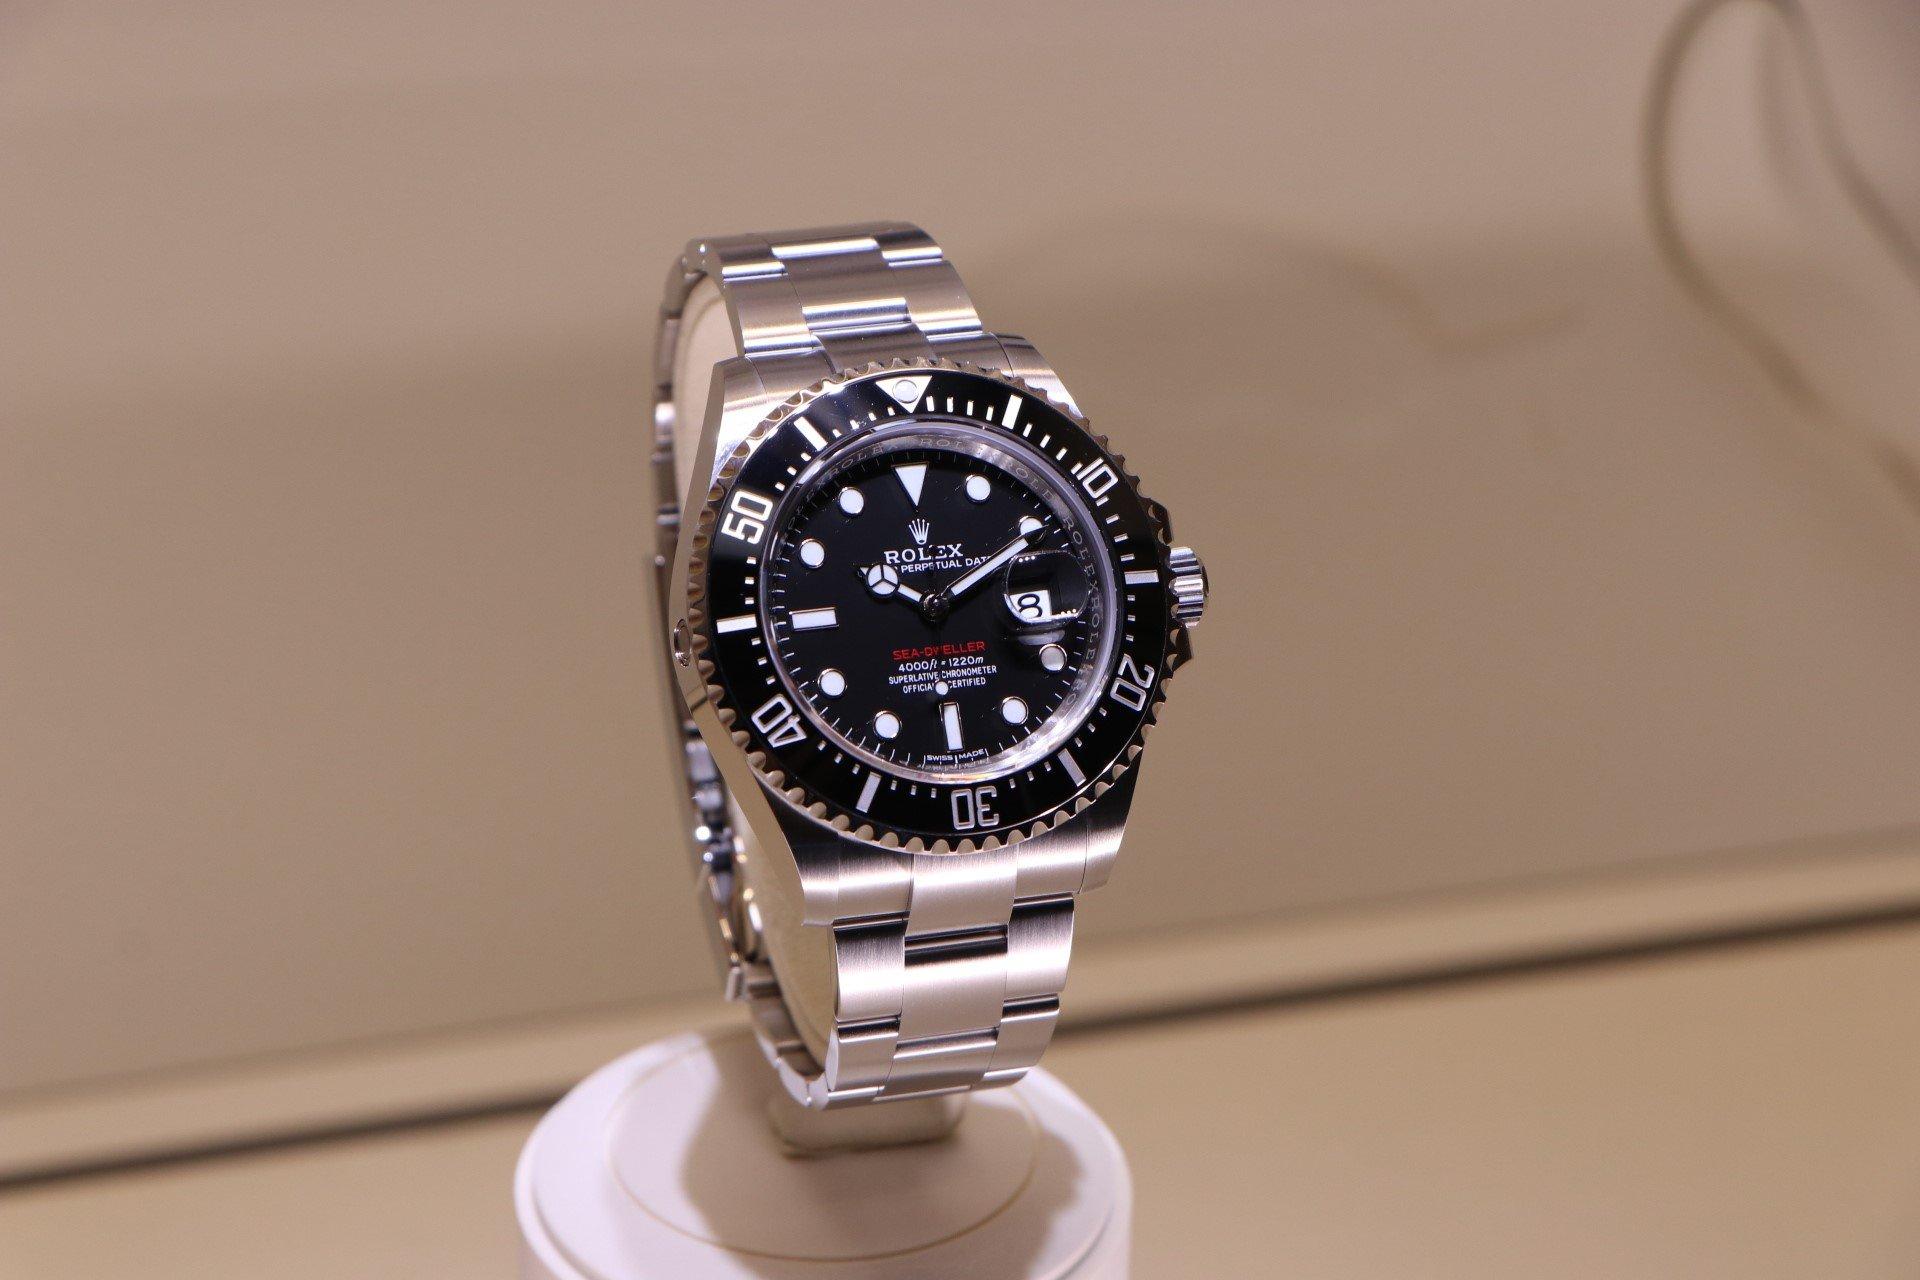 Rolex Sea-Dweller 126600 at baselworld 2017